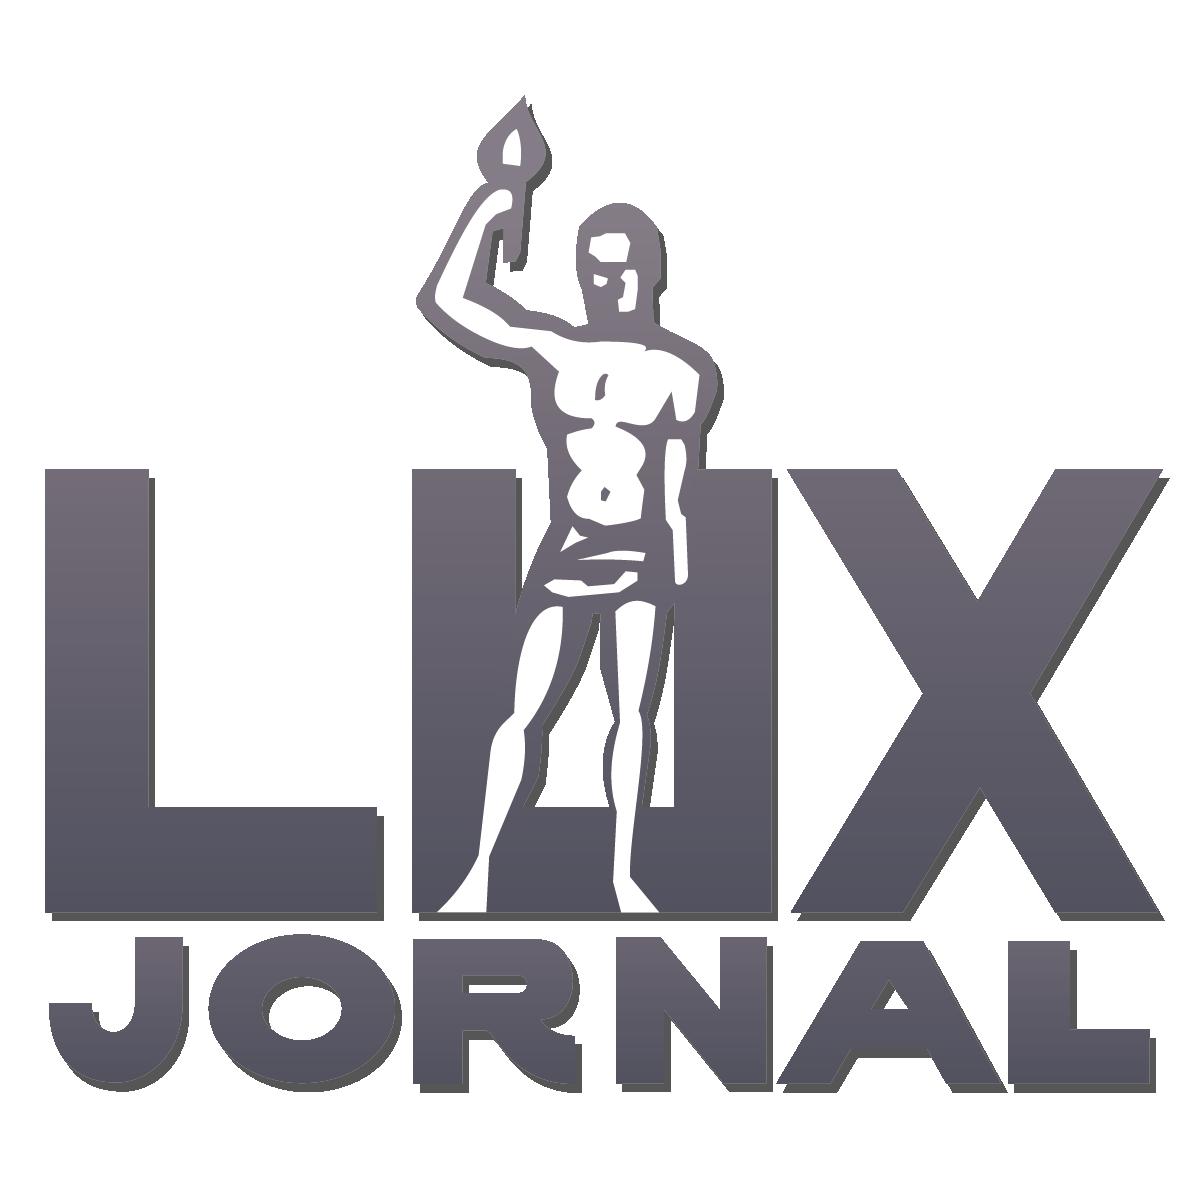 Lux Jornal Recortes